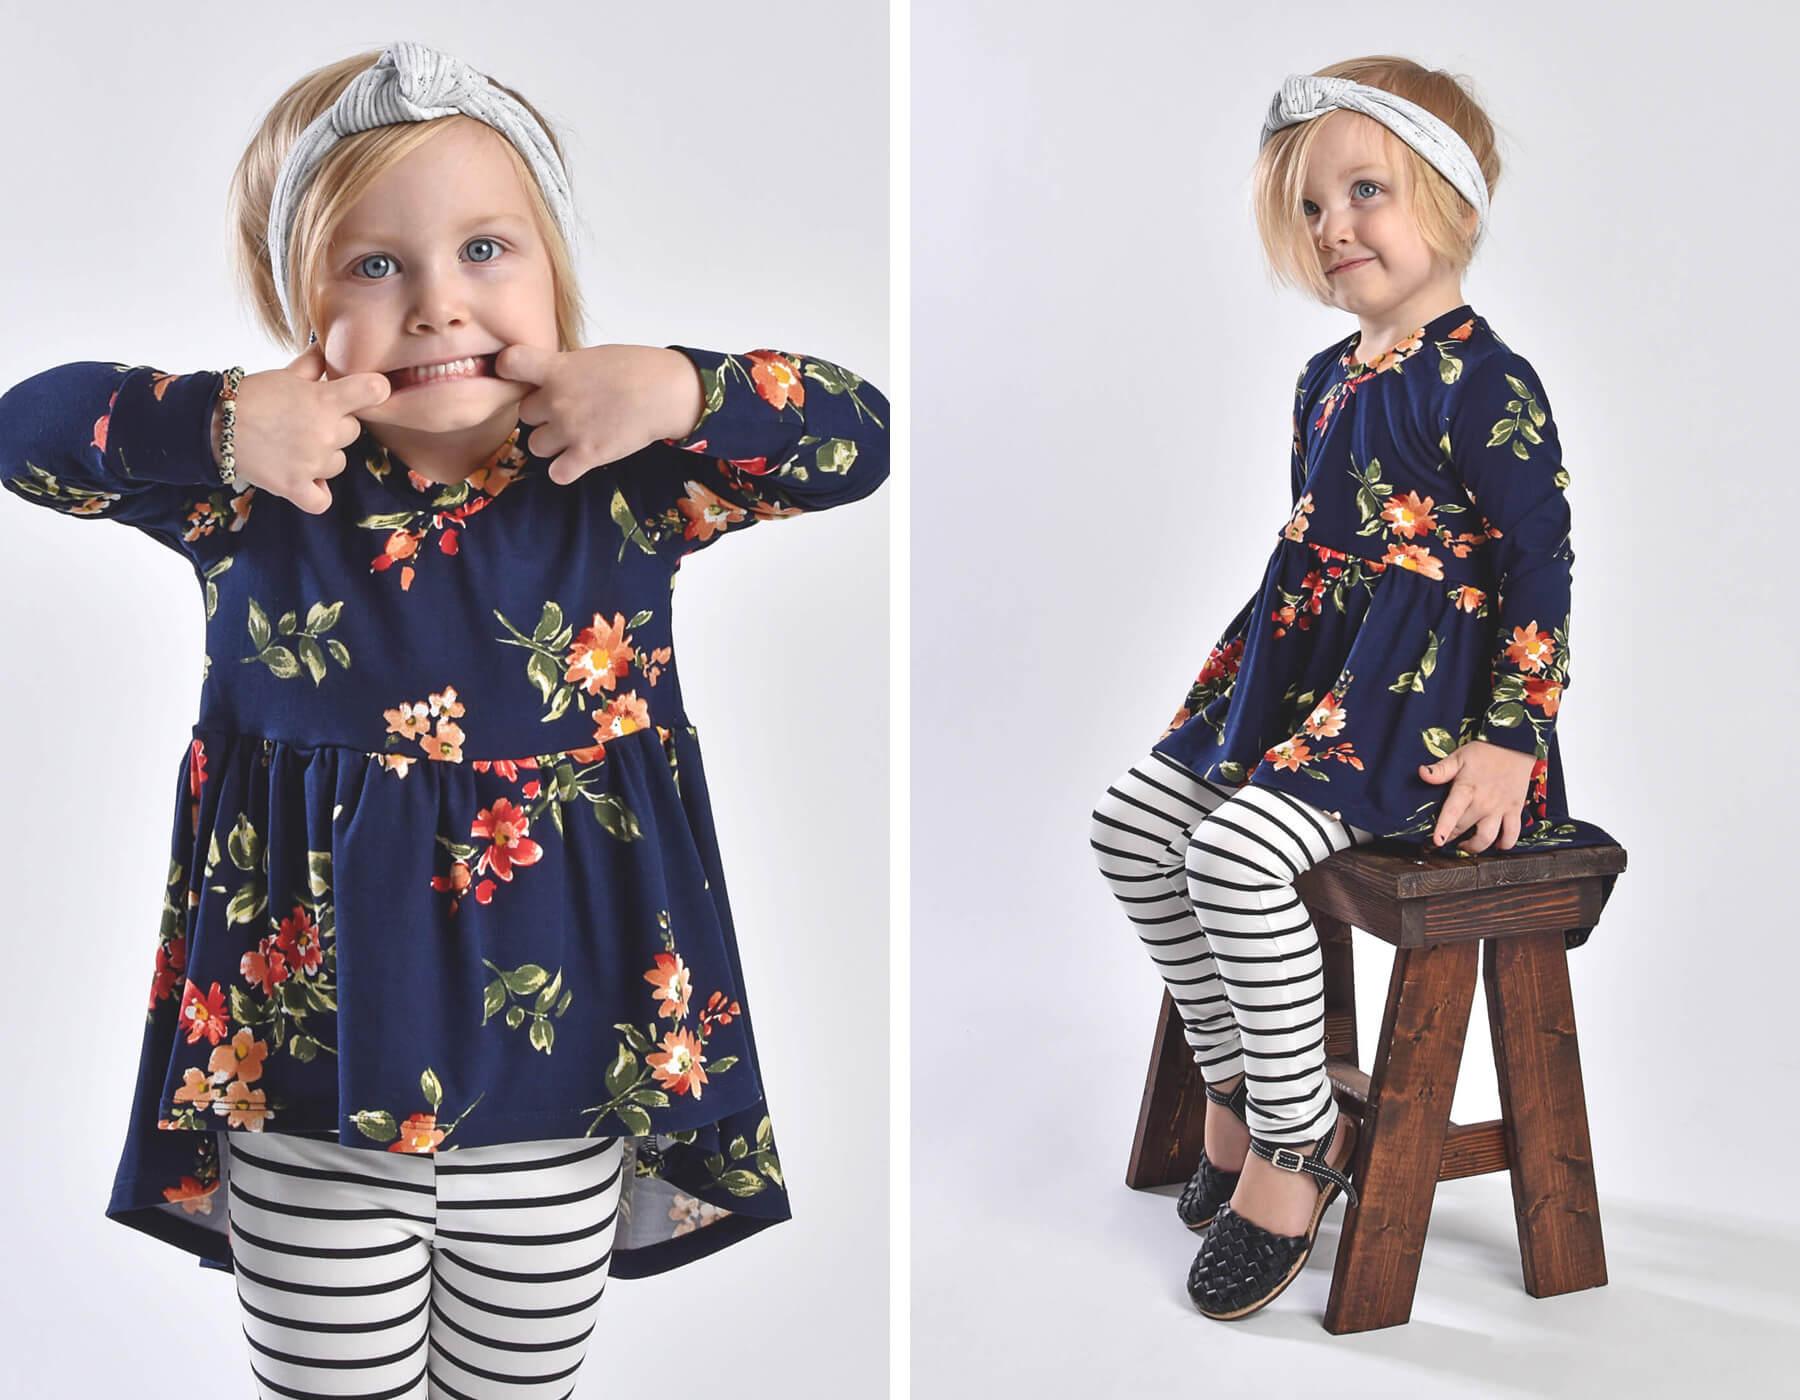 hilo-top-navy-floral-leggins-ivory-blk-stripes-briabay